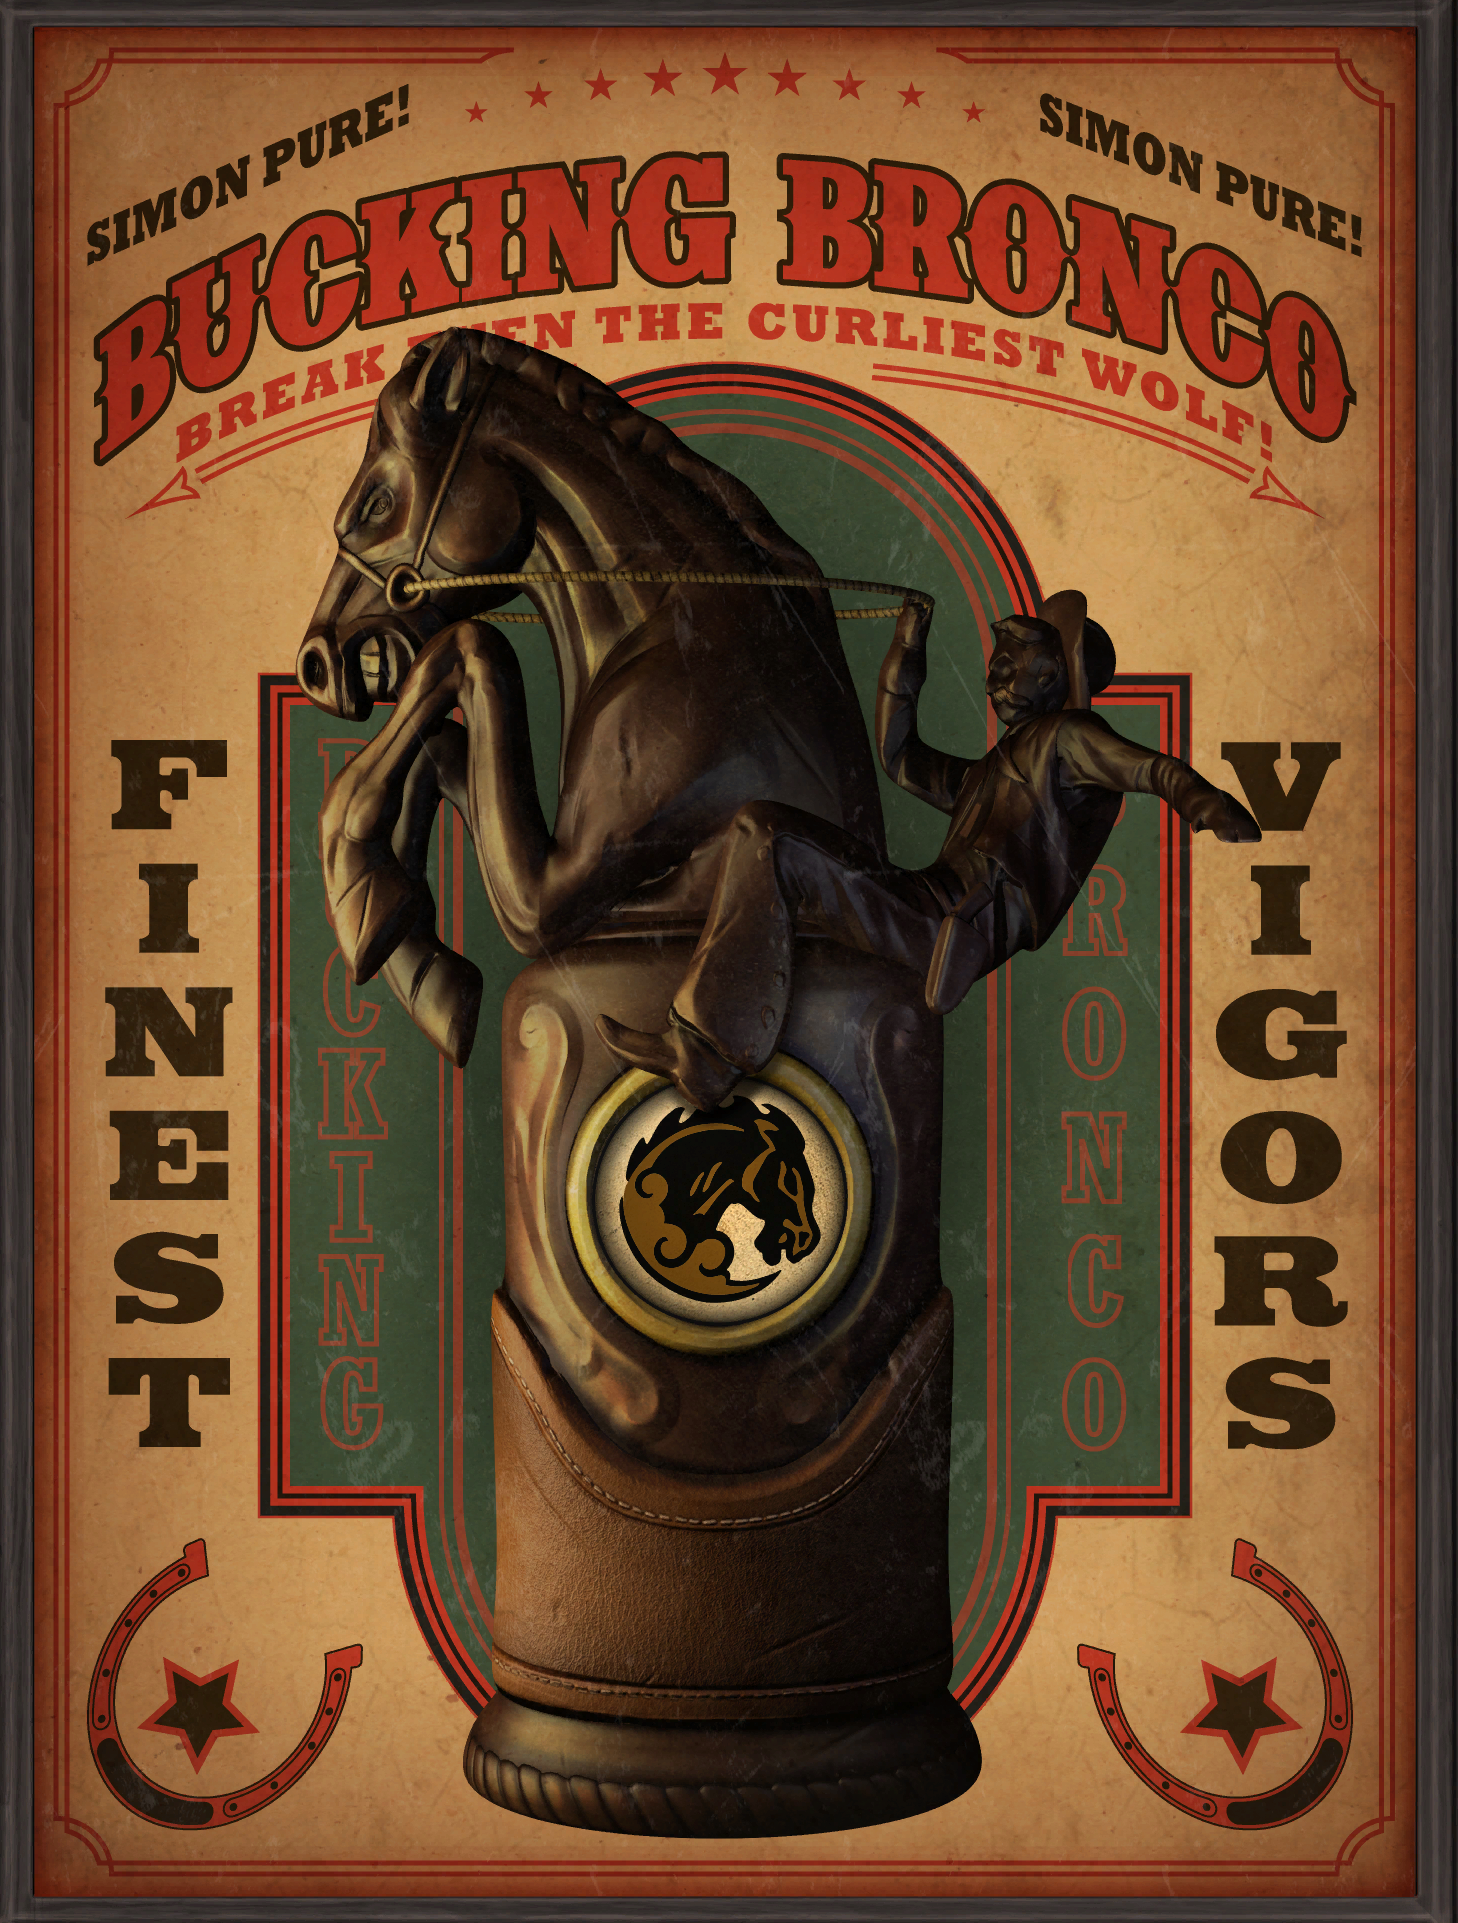 Archivo:Buckingbronco ad 1.png